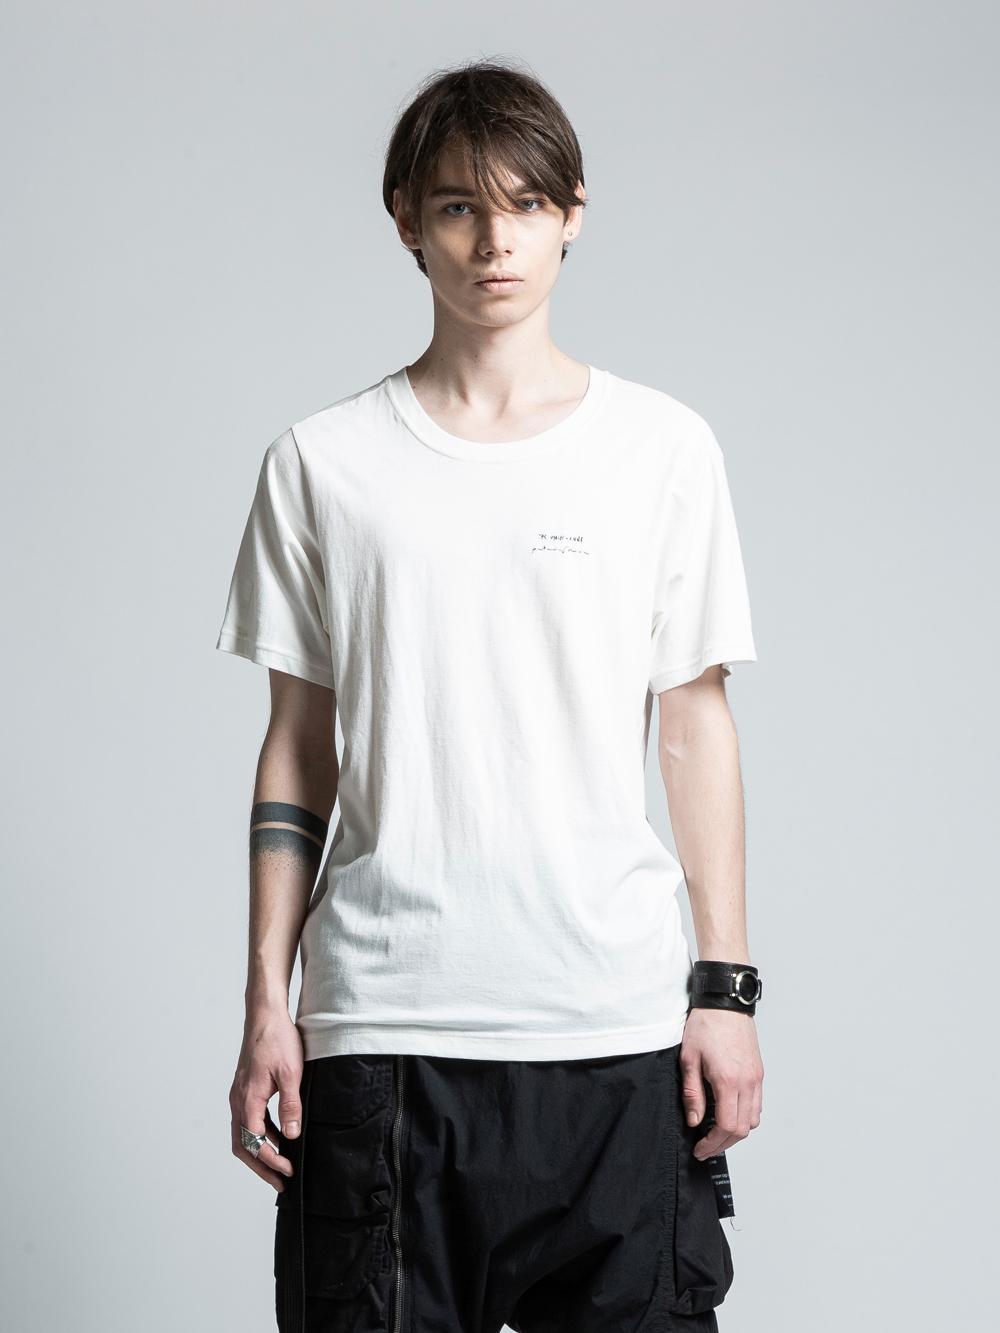 VI-PM-005-01 / PATRICIA MARCH コラボレーションバックプリントTシャツ